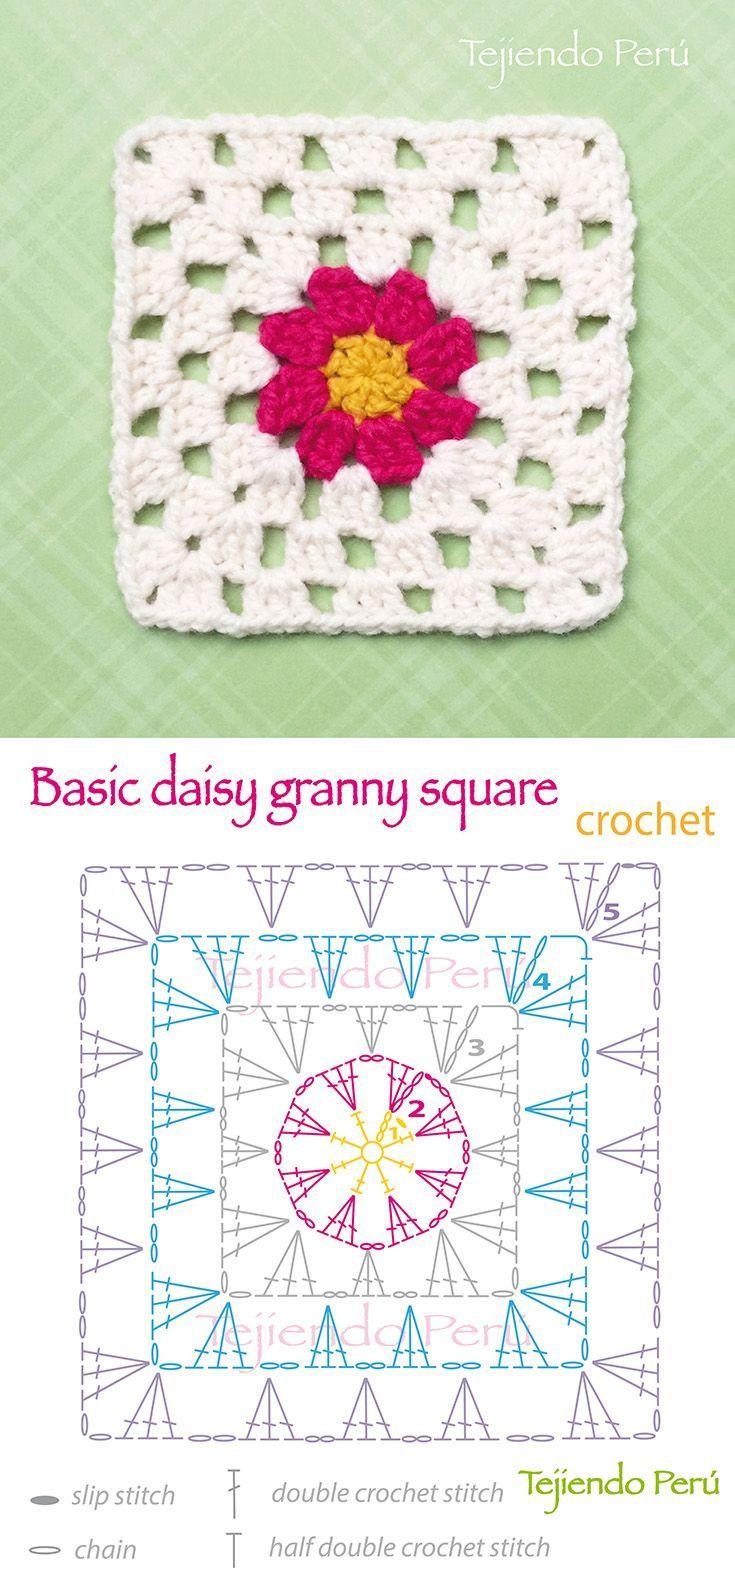 Crochet: basic daisy granny square pattern (diagram or chart ...